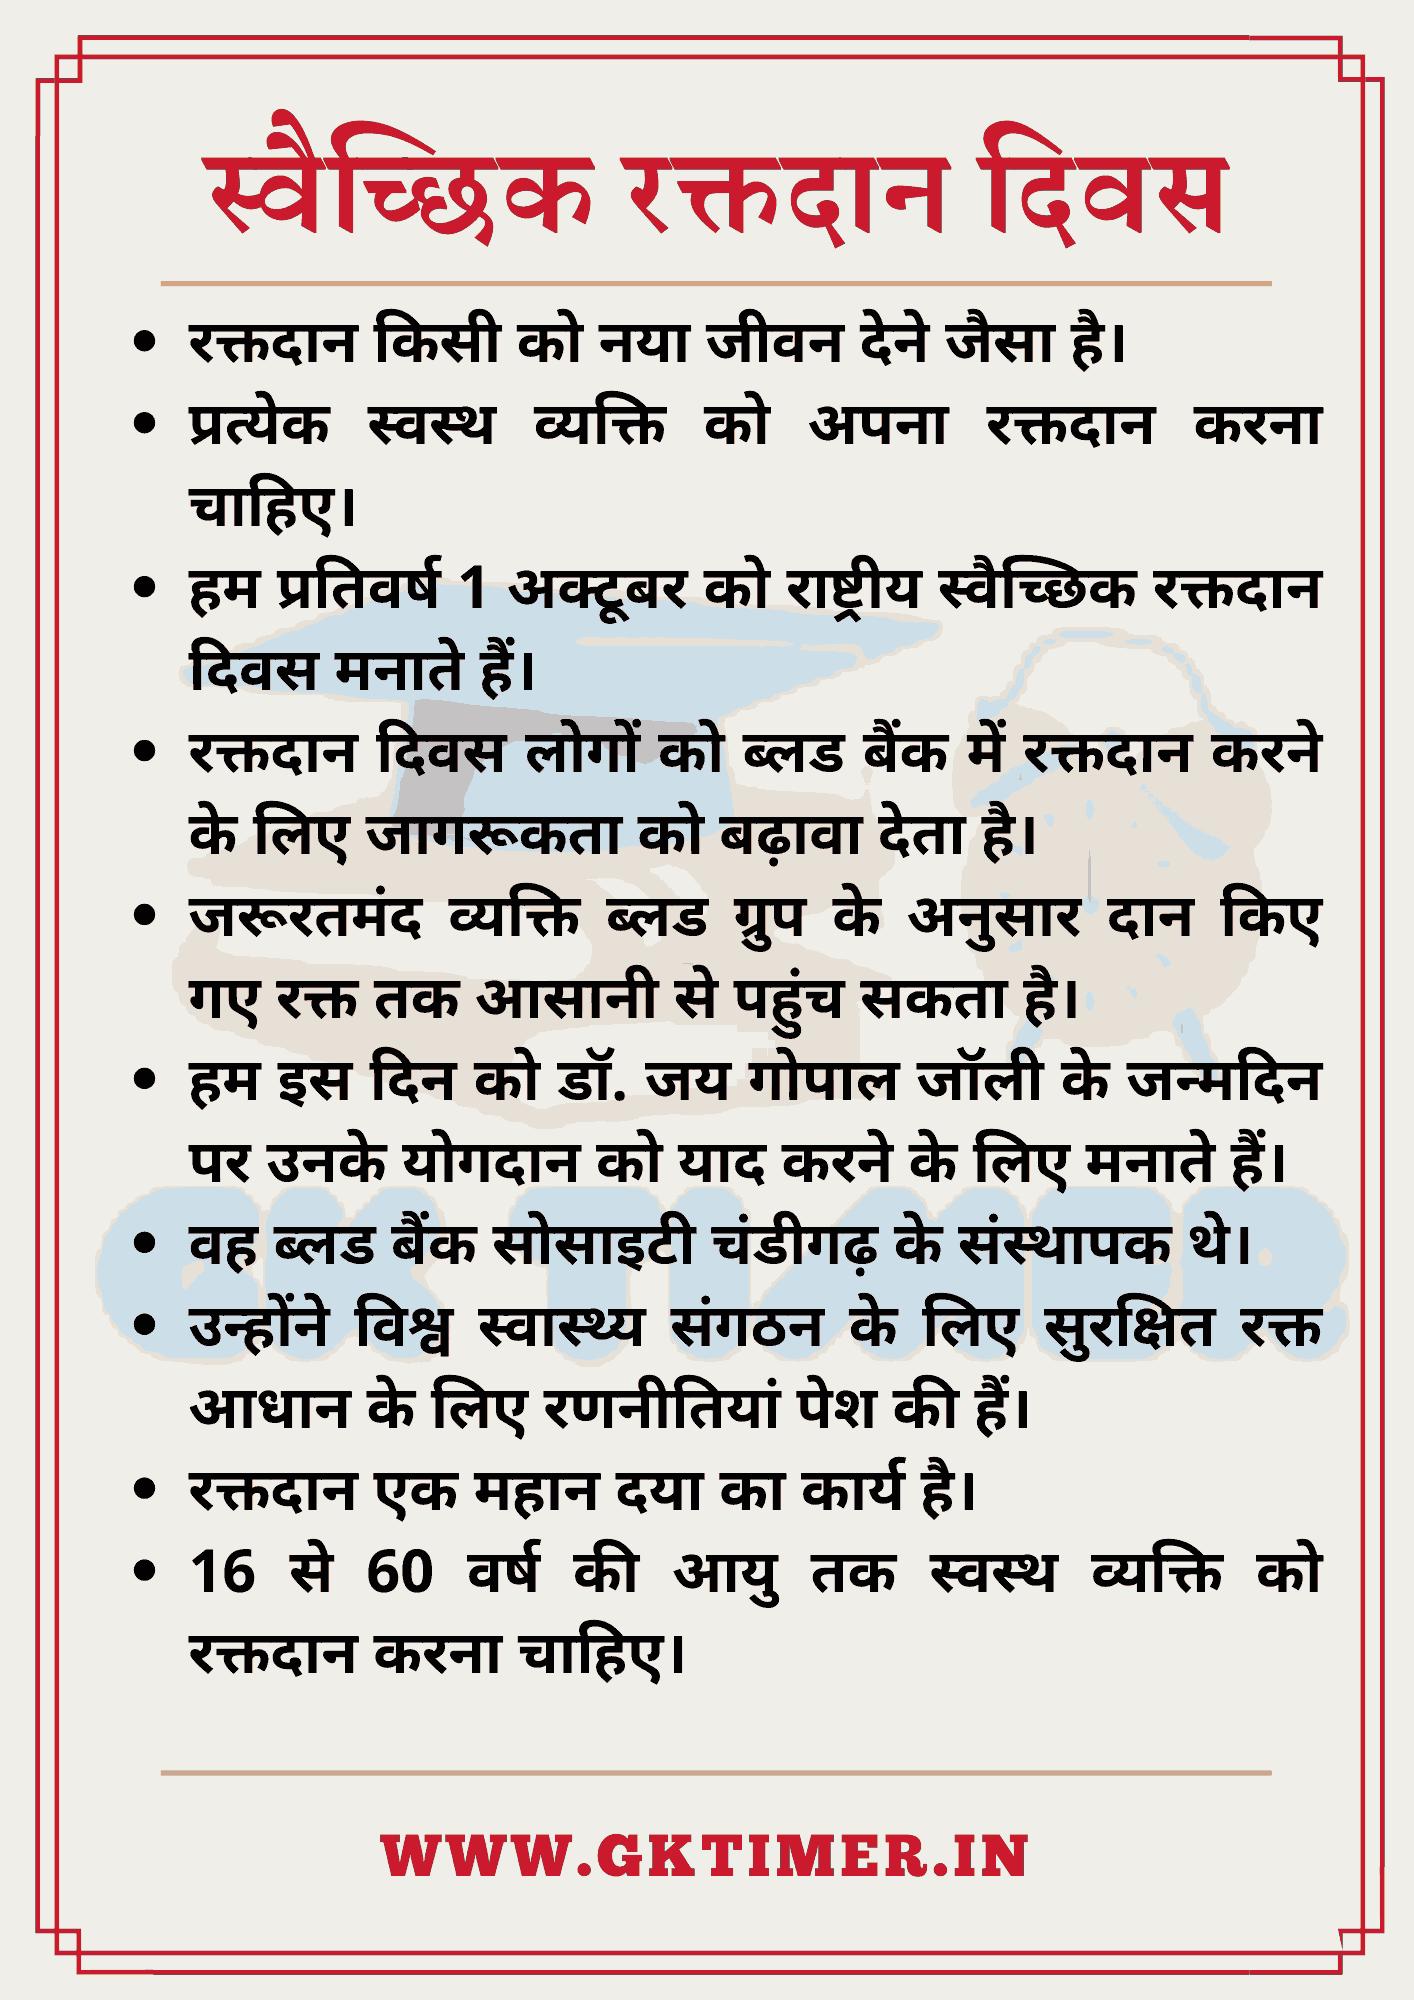 राष्ट्रीय स्वैच्छिक रक्तदान दिवस पर निबंध | Essay On National Voluntary Blood Donation Day in Hindi | 10 Lines On National Voluntary Blood Donation Day in Hindi